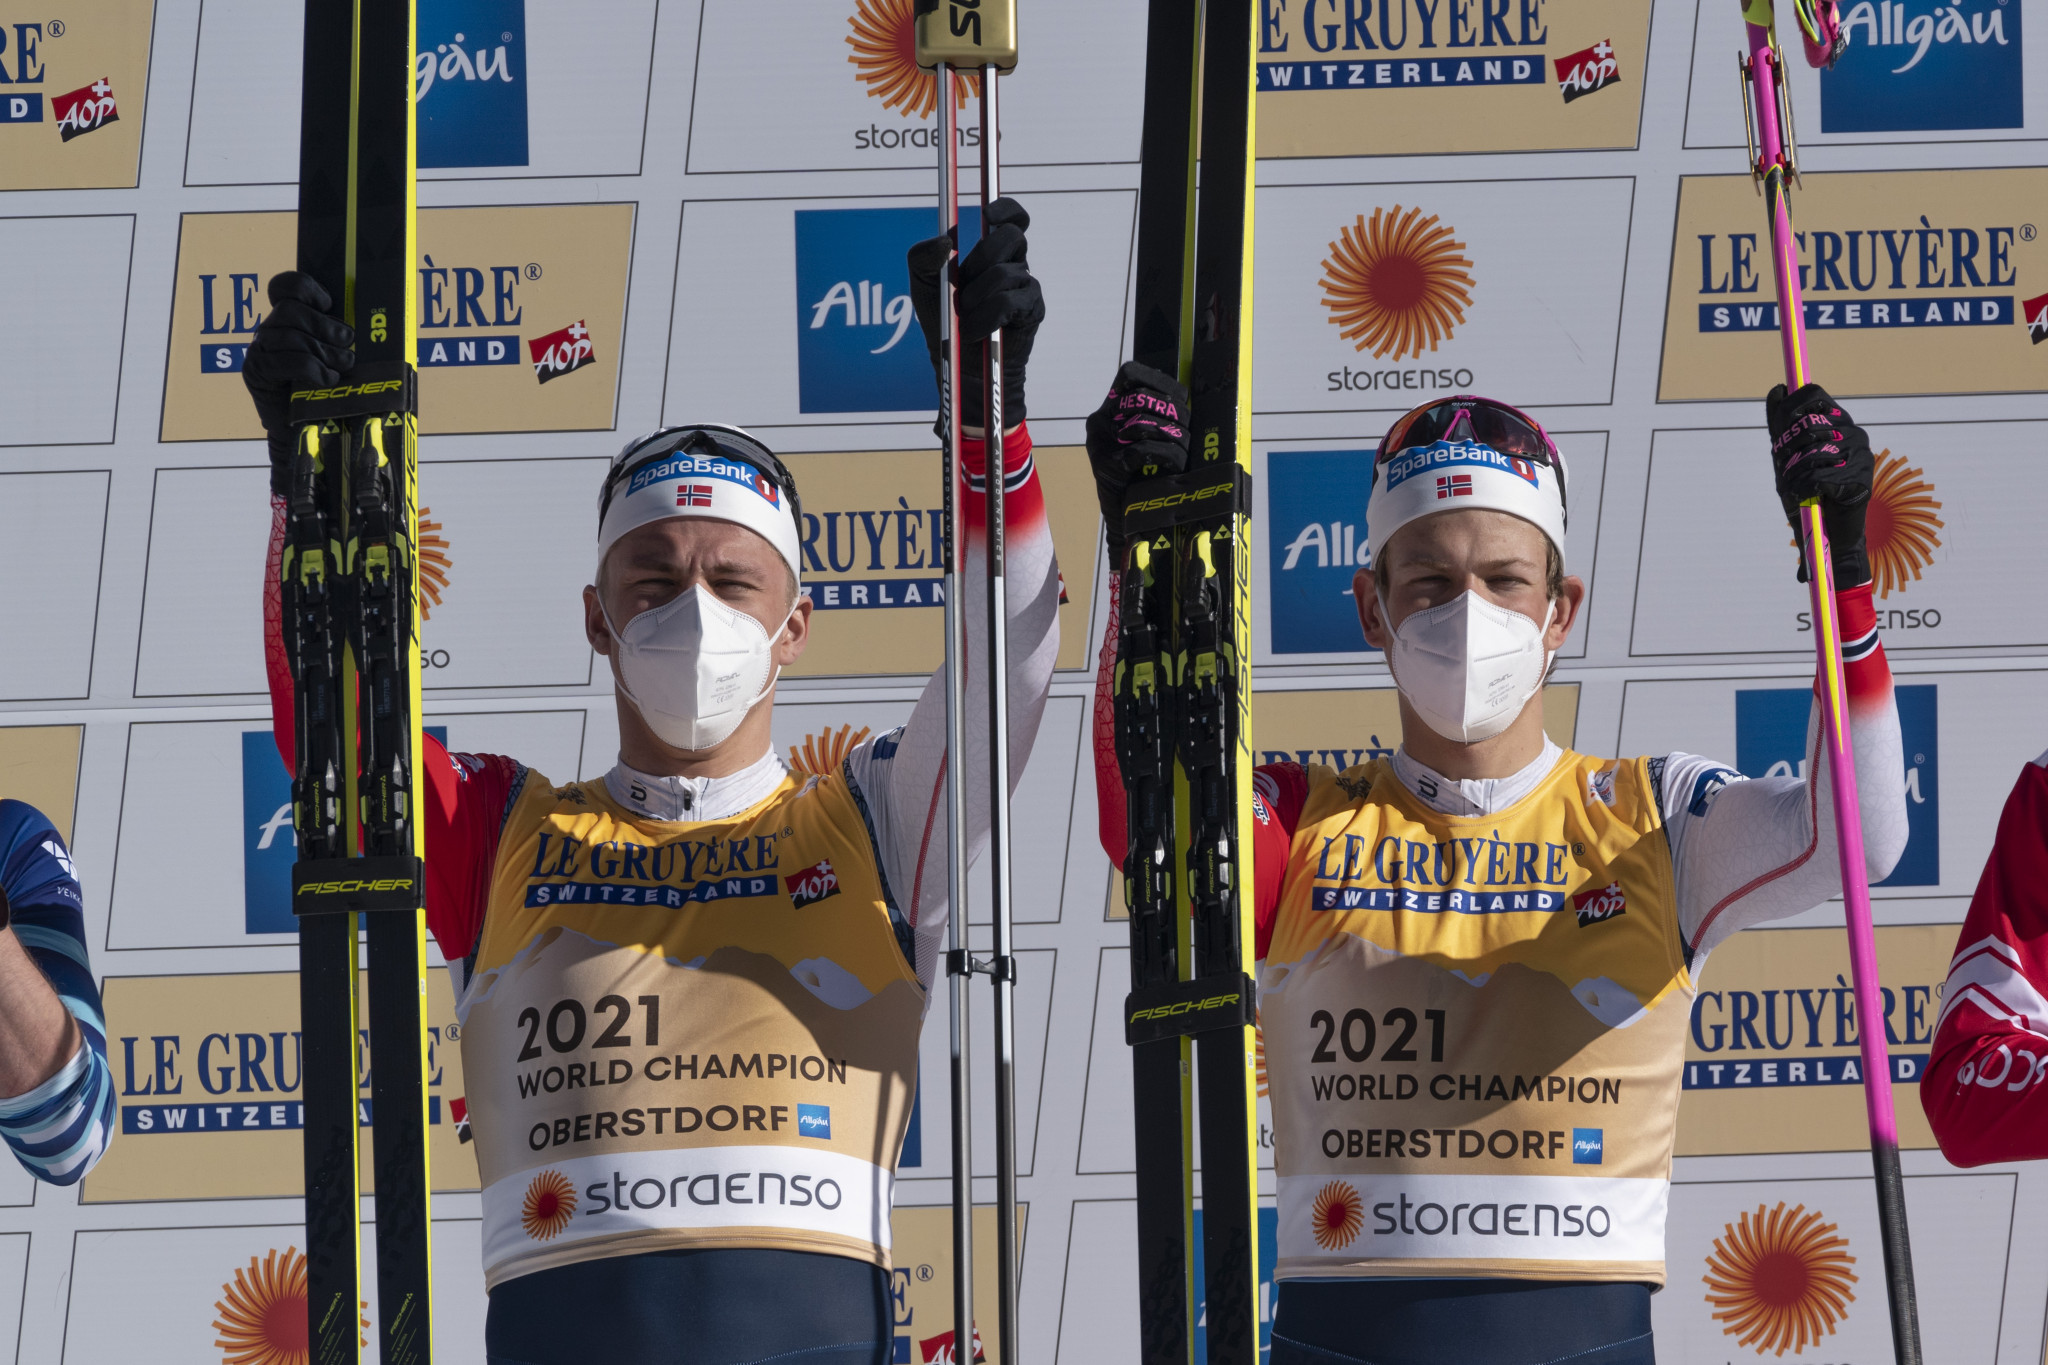 Klæbo and Sundling earn second gold in team events at Nordic World Ski Championships